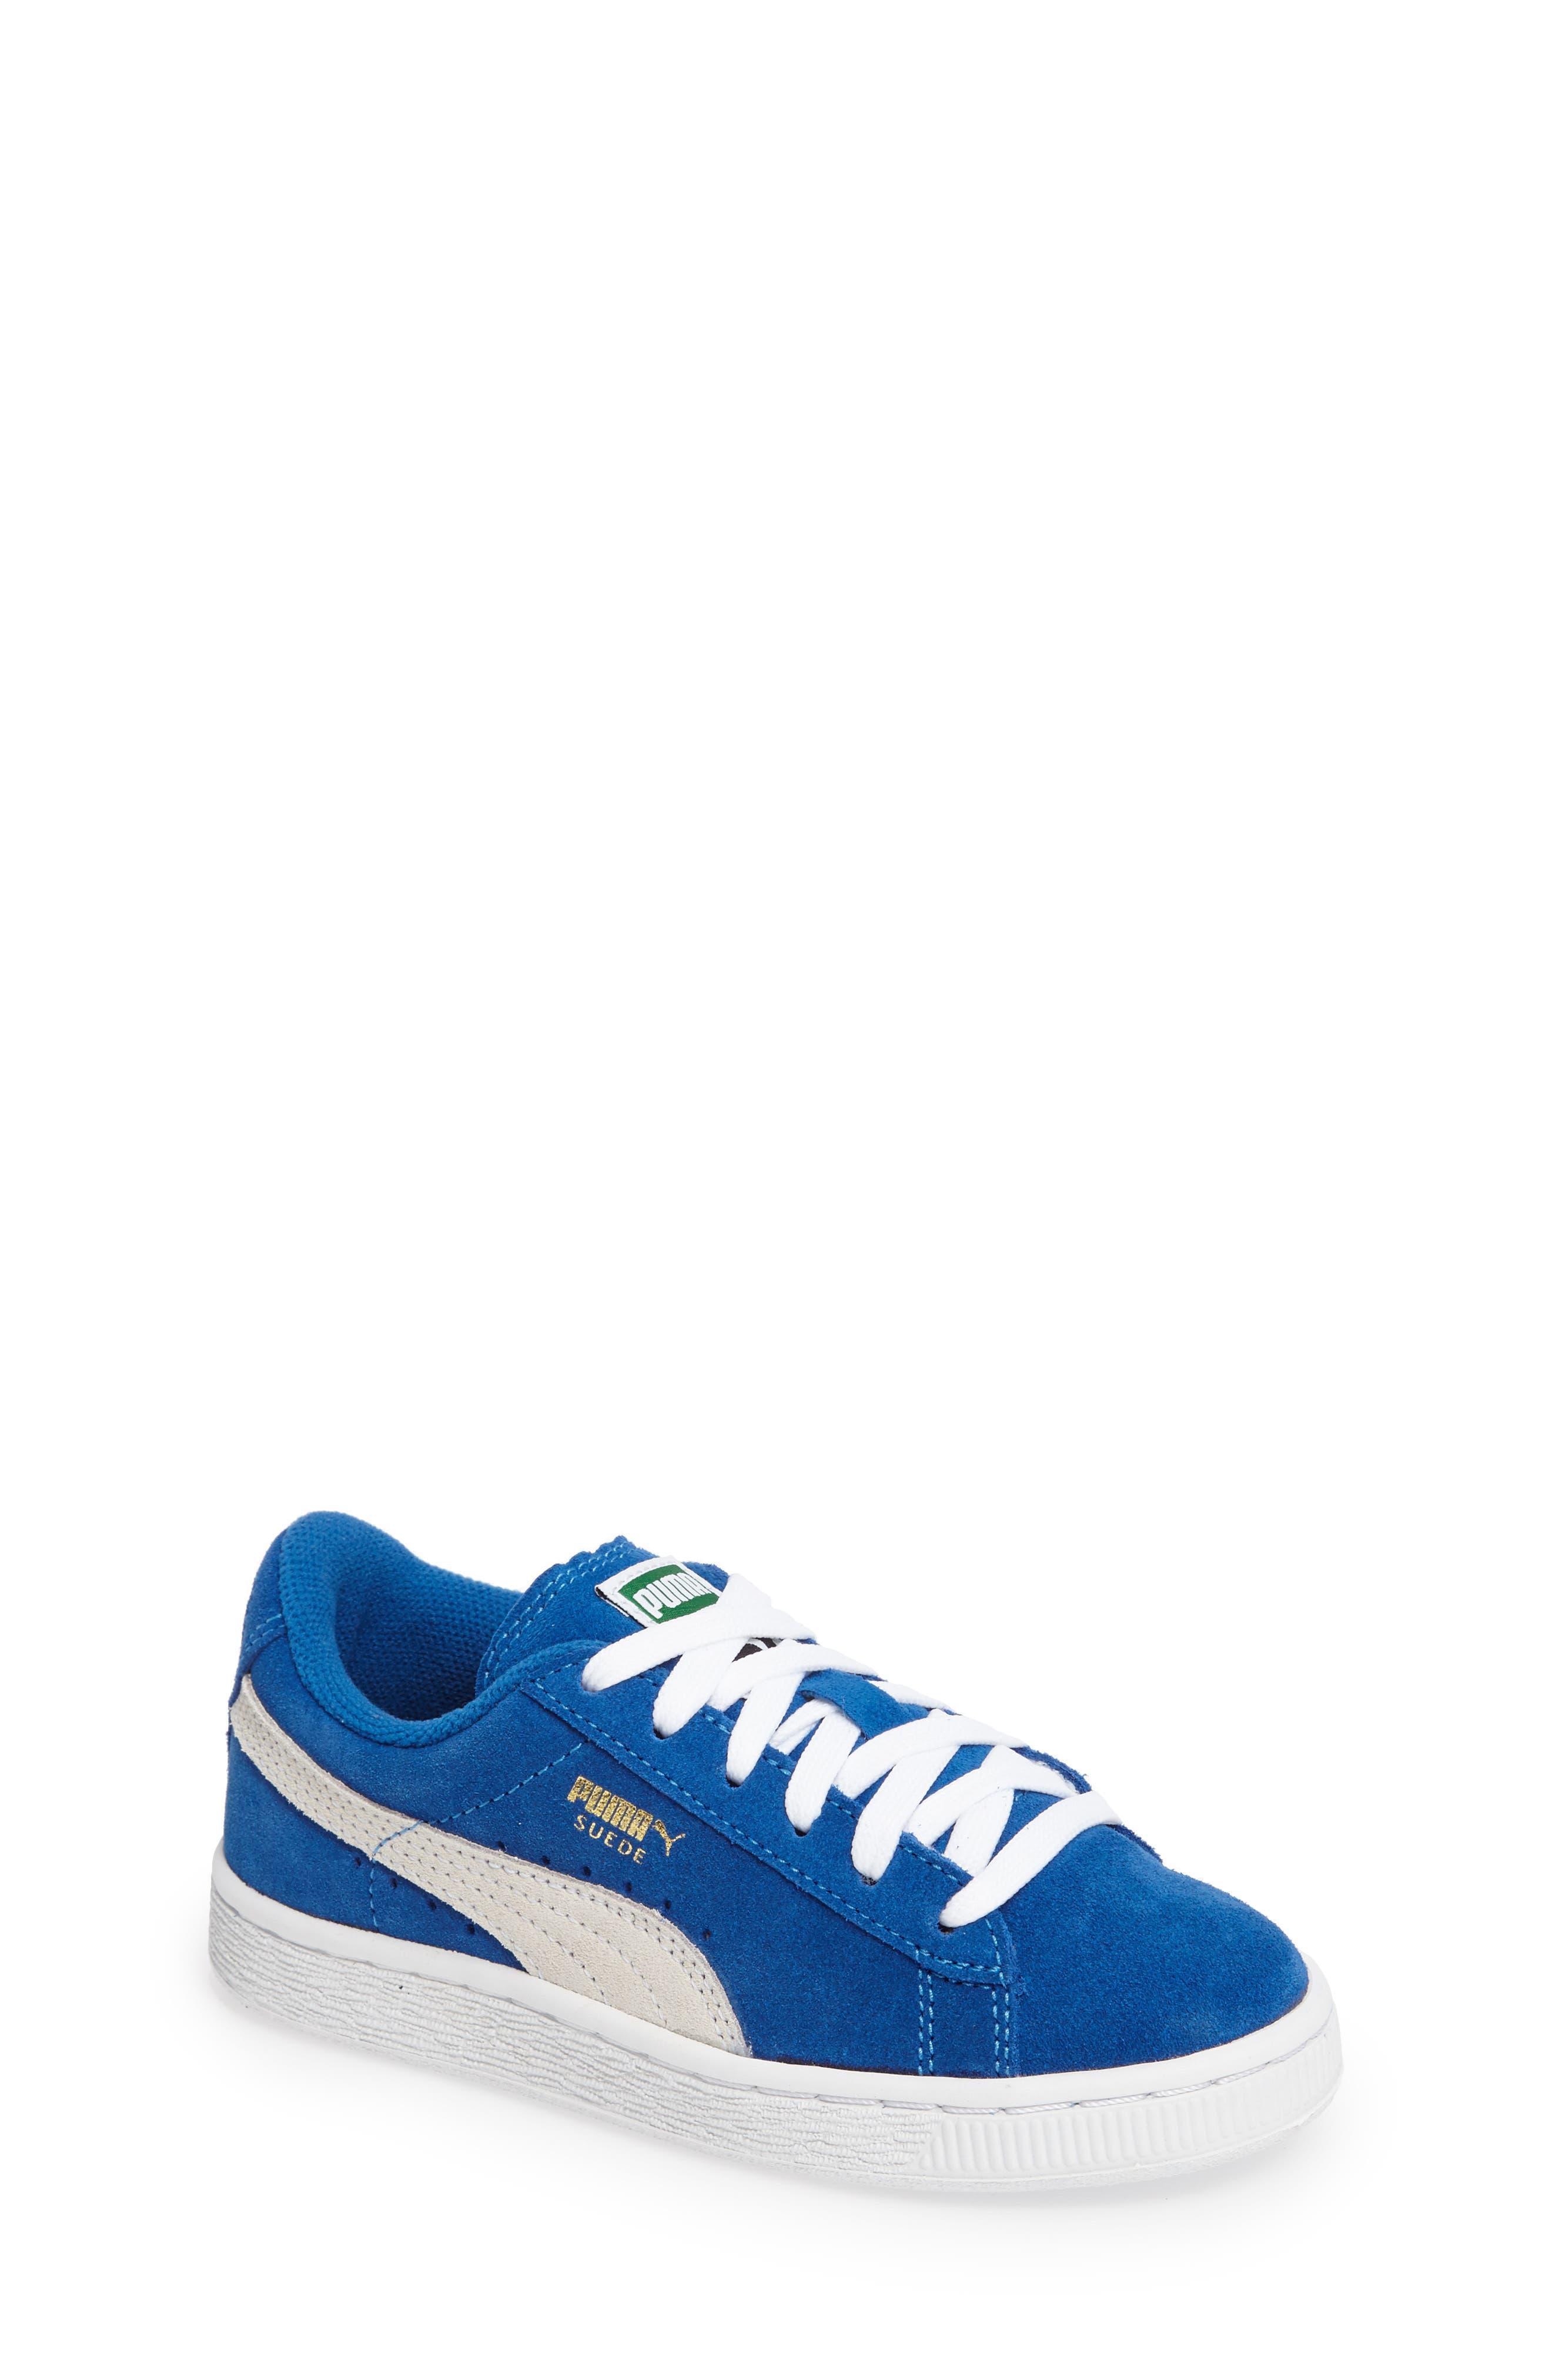 PUMA Suede PS Sneaker